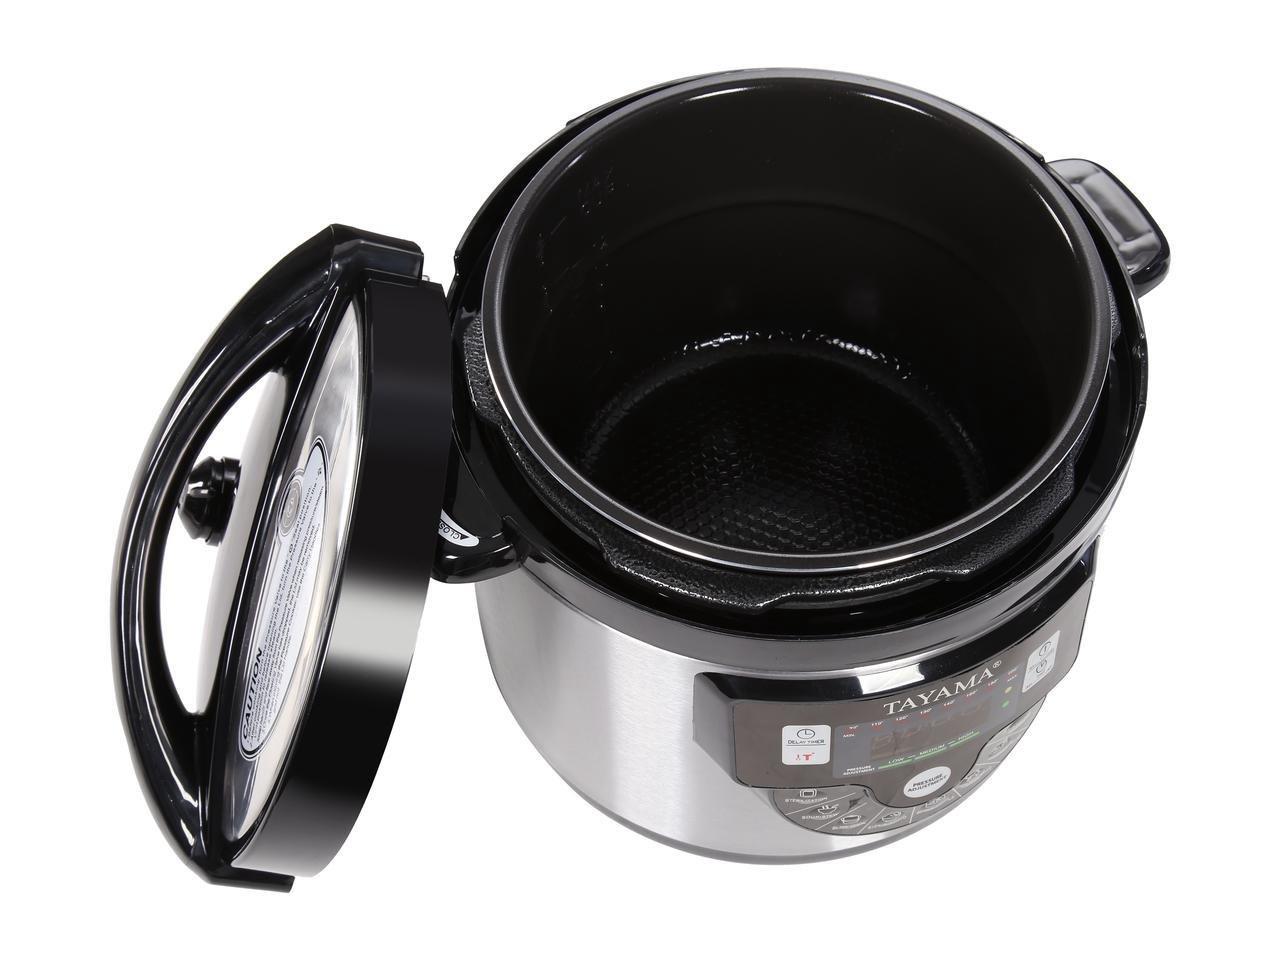 Tayama TMC-60XL 6 quart 8-in-1 Multi-Function Pressure Cooker, Black by TAYAMA (Image #7)